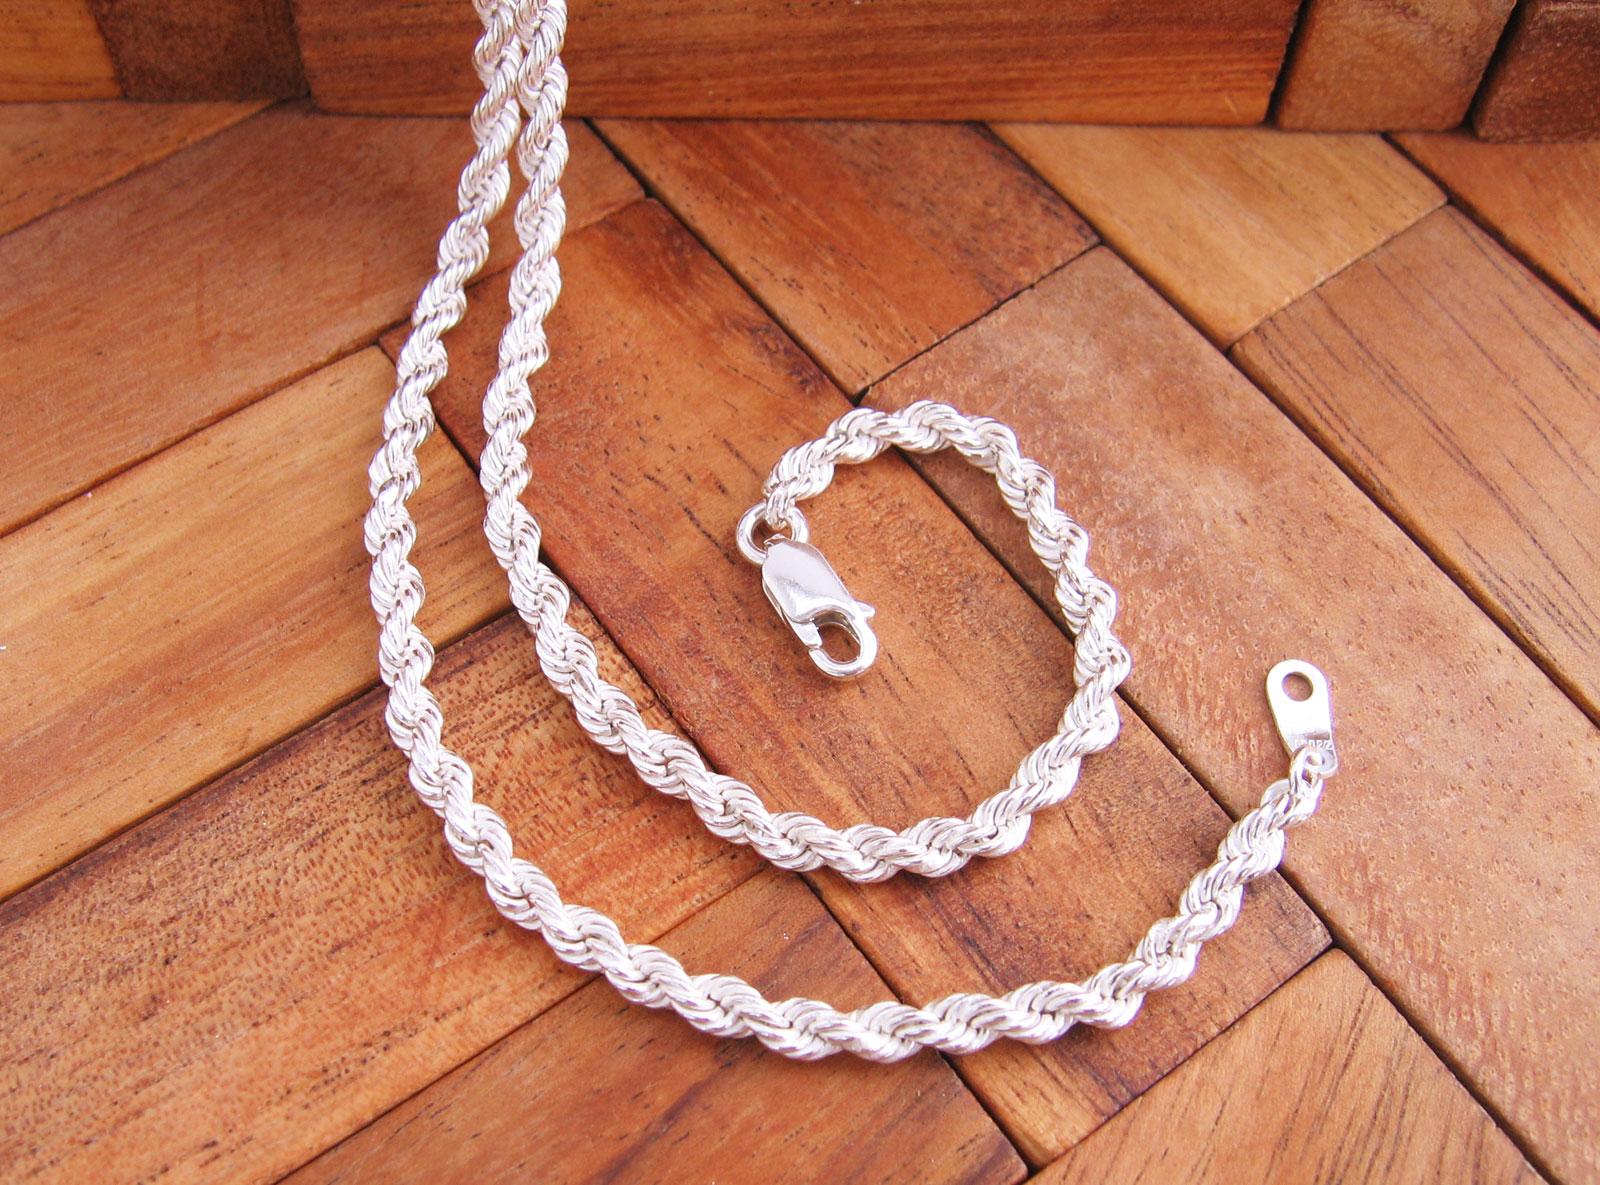 6fe96f1caa25 Cordón Salomónico de Plata de 1ª Ley 925 ml - PlataOle.com